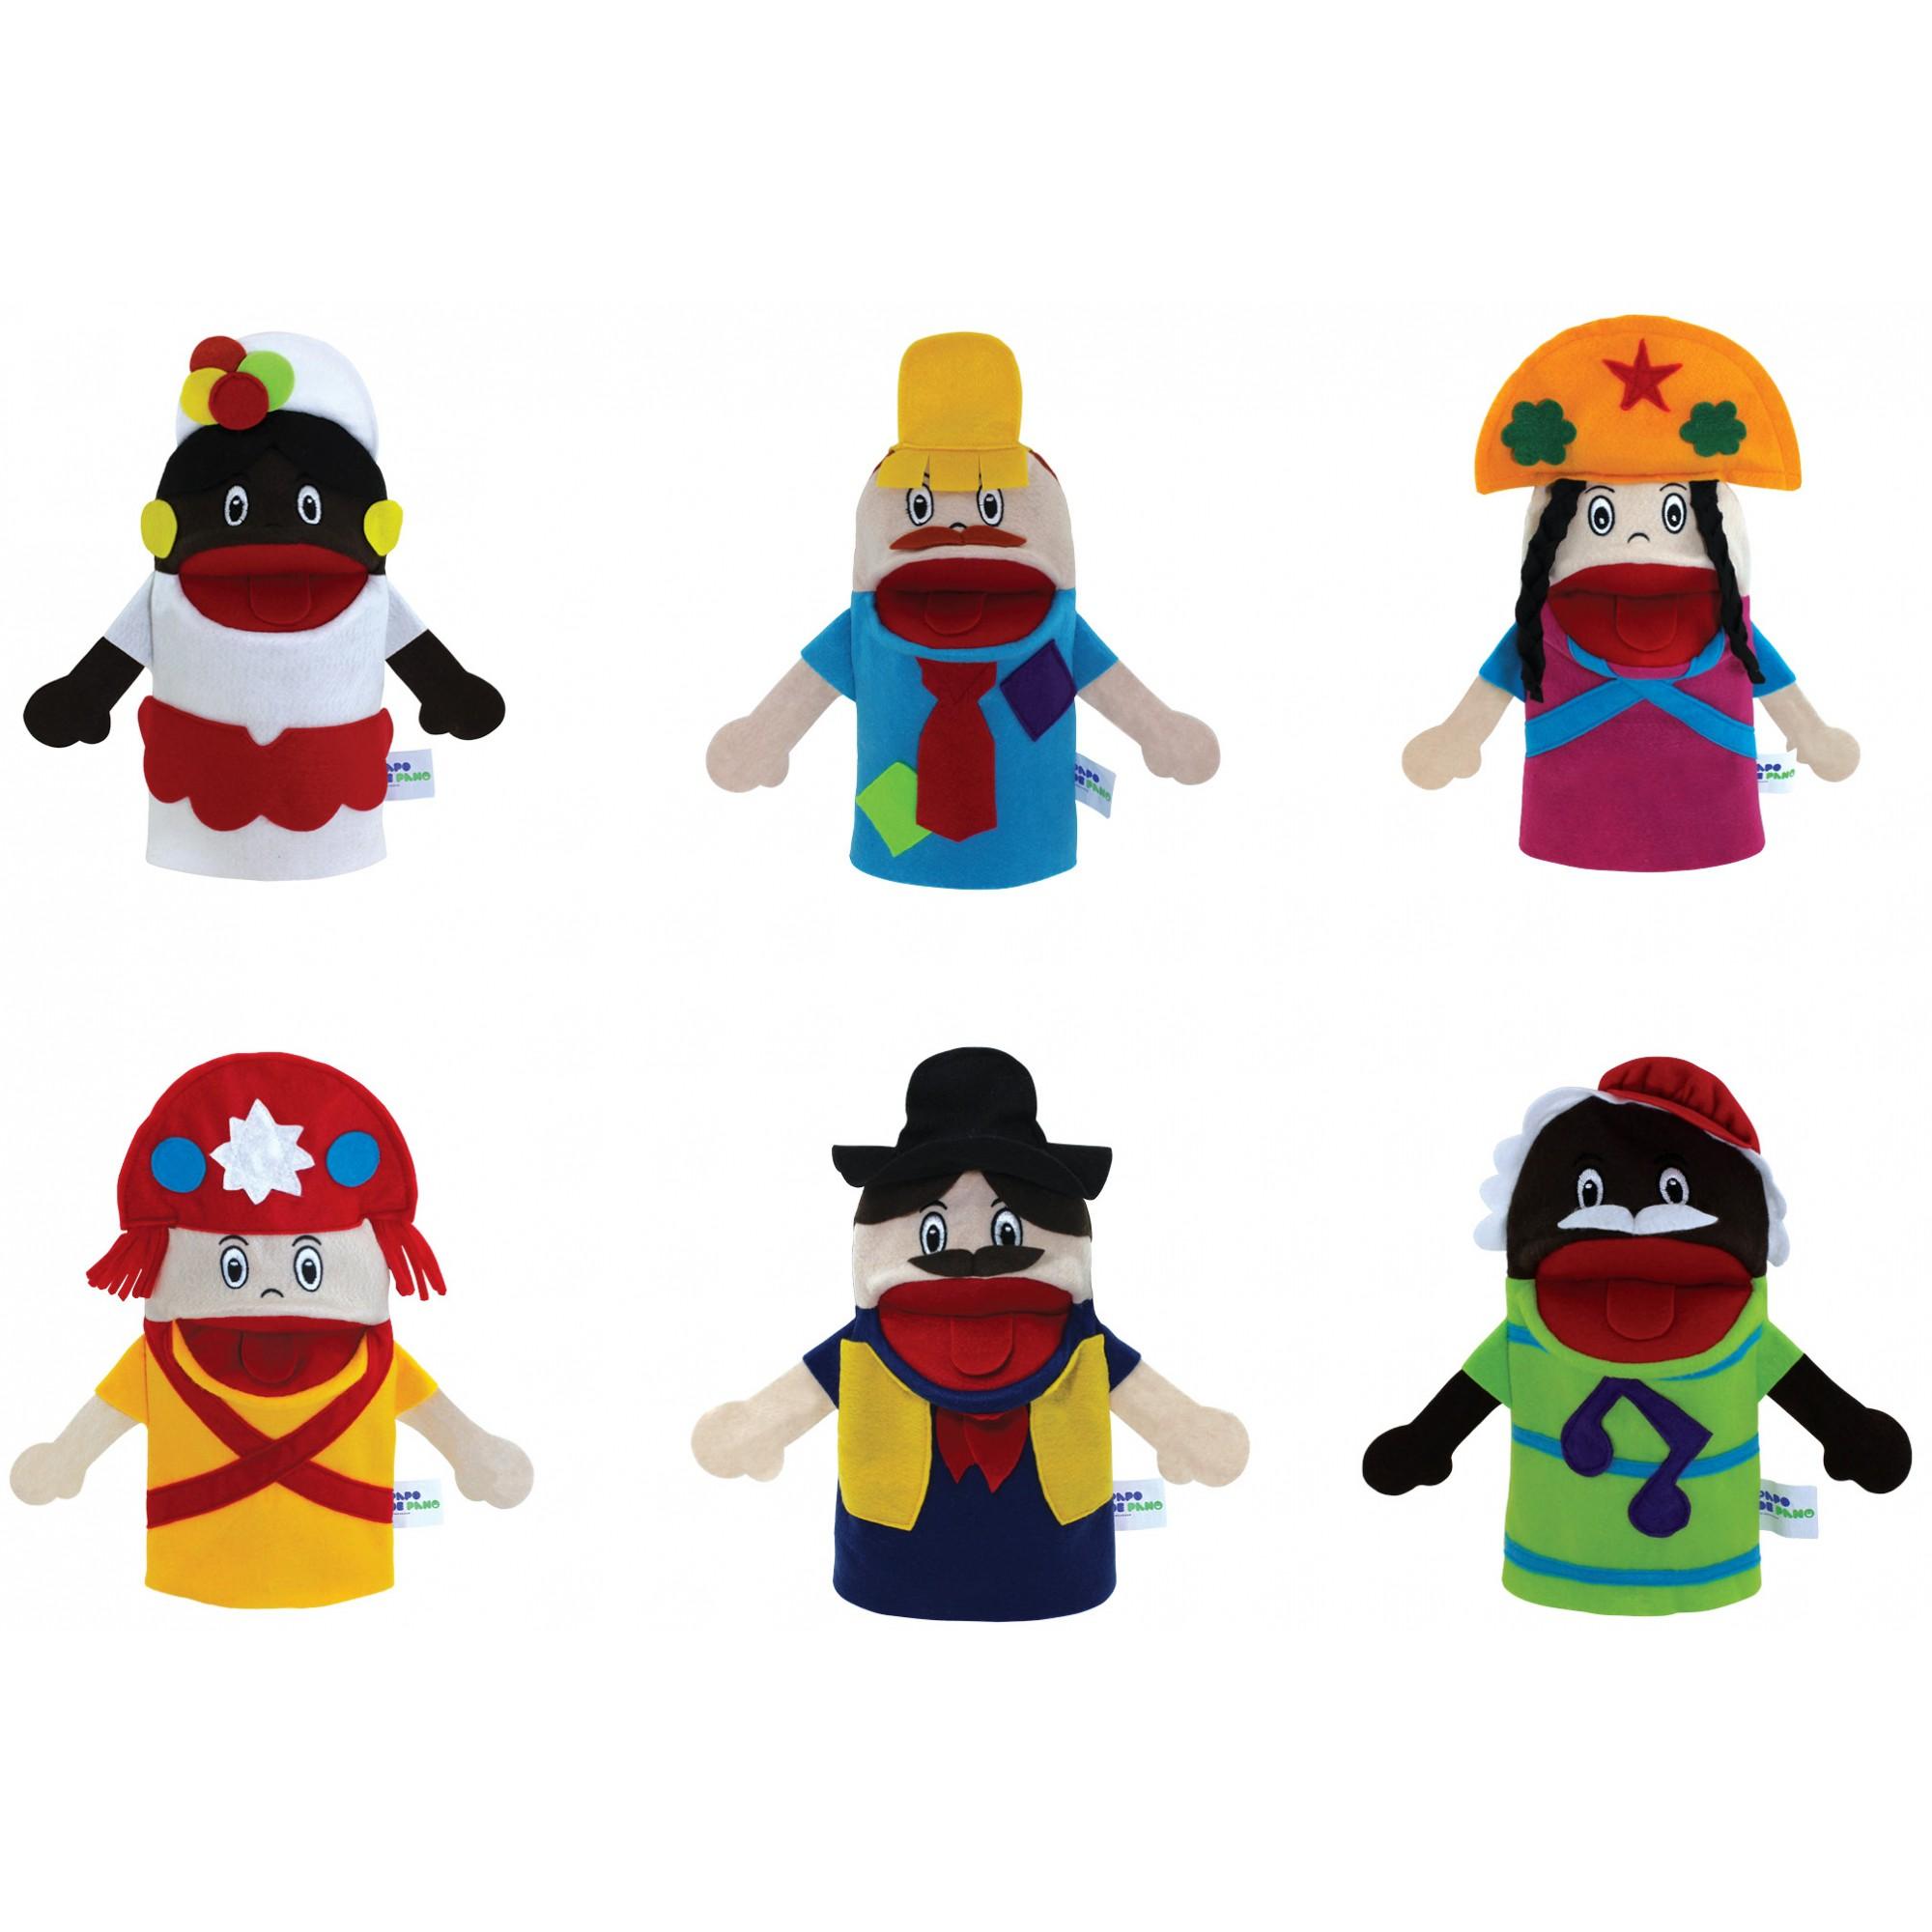 Brinquedo Educativo Conjunto de Fantoches Regionais